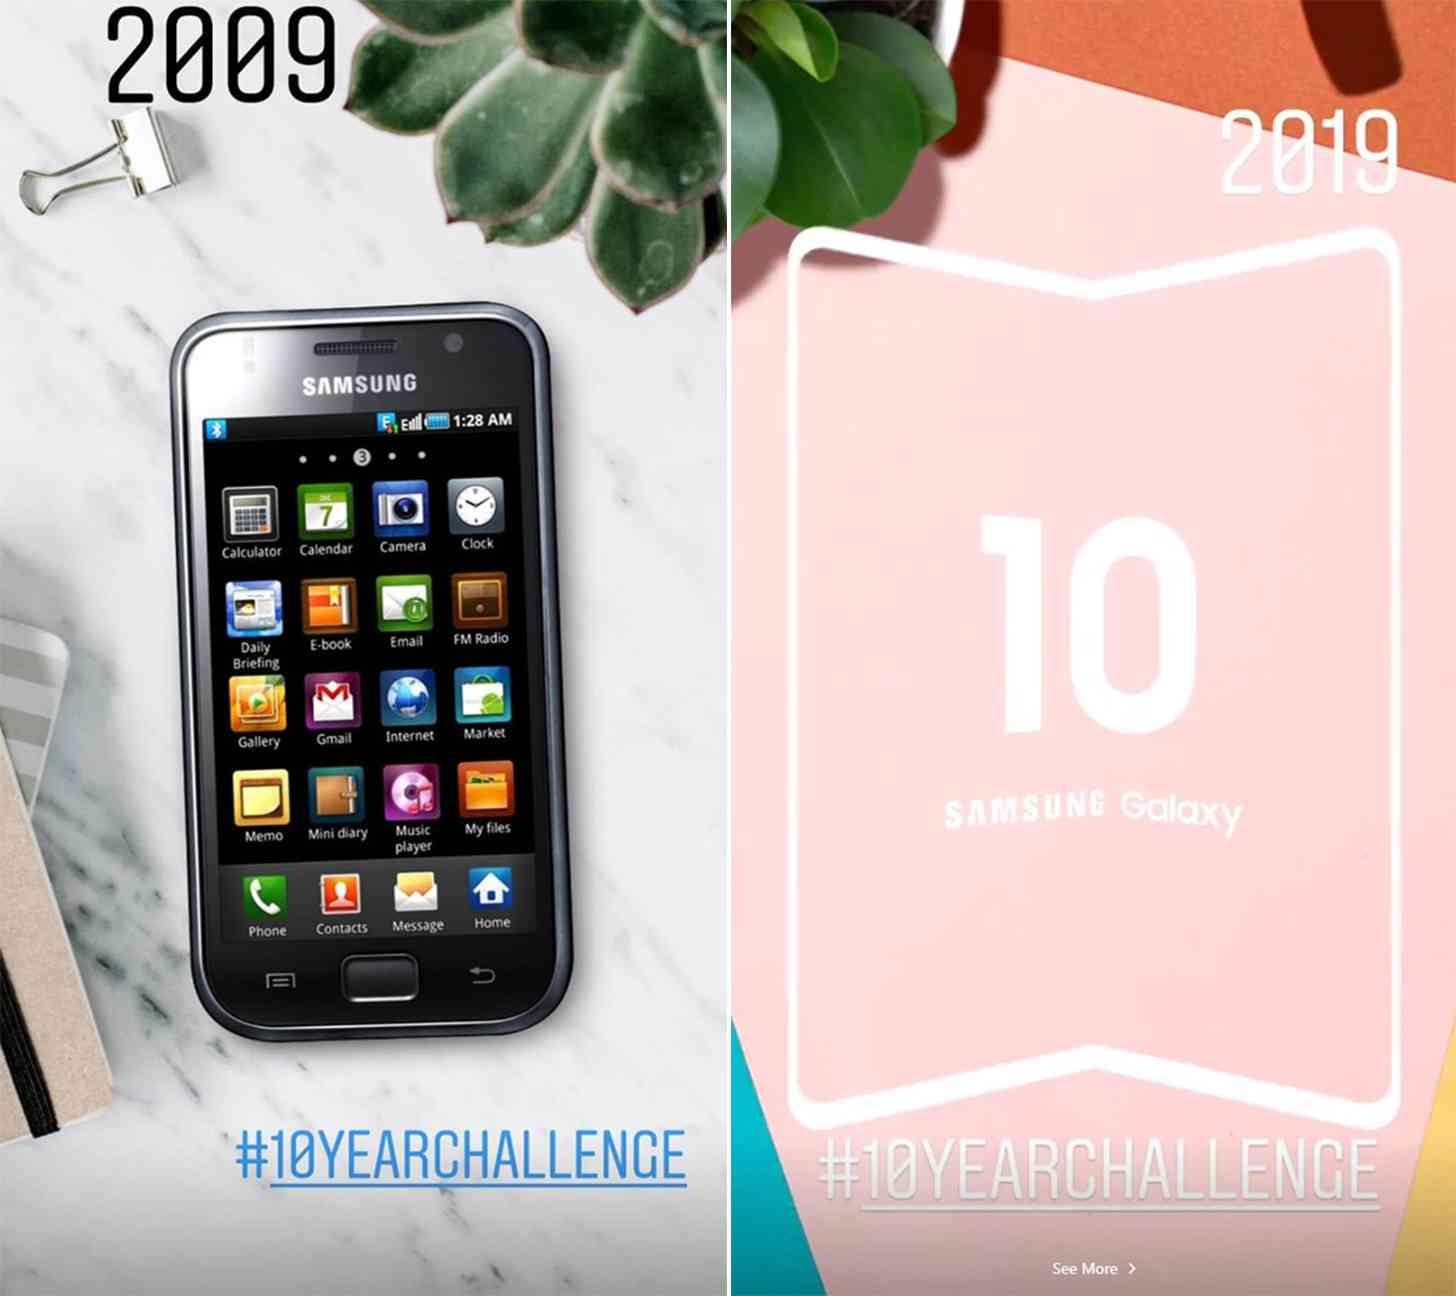 Samsung #10YearChallenge foldable smartphone teaser